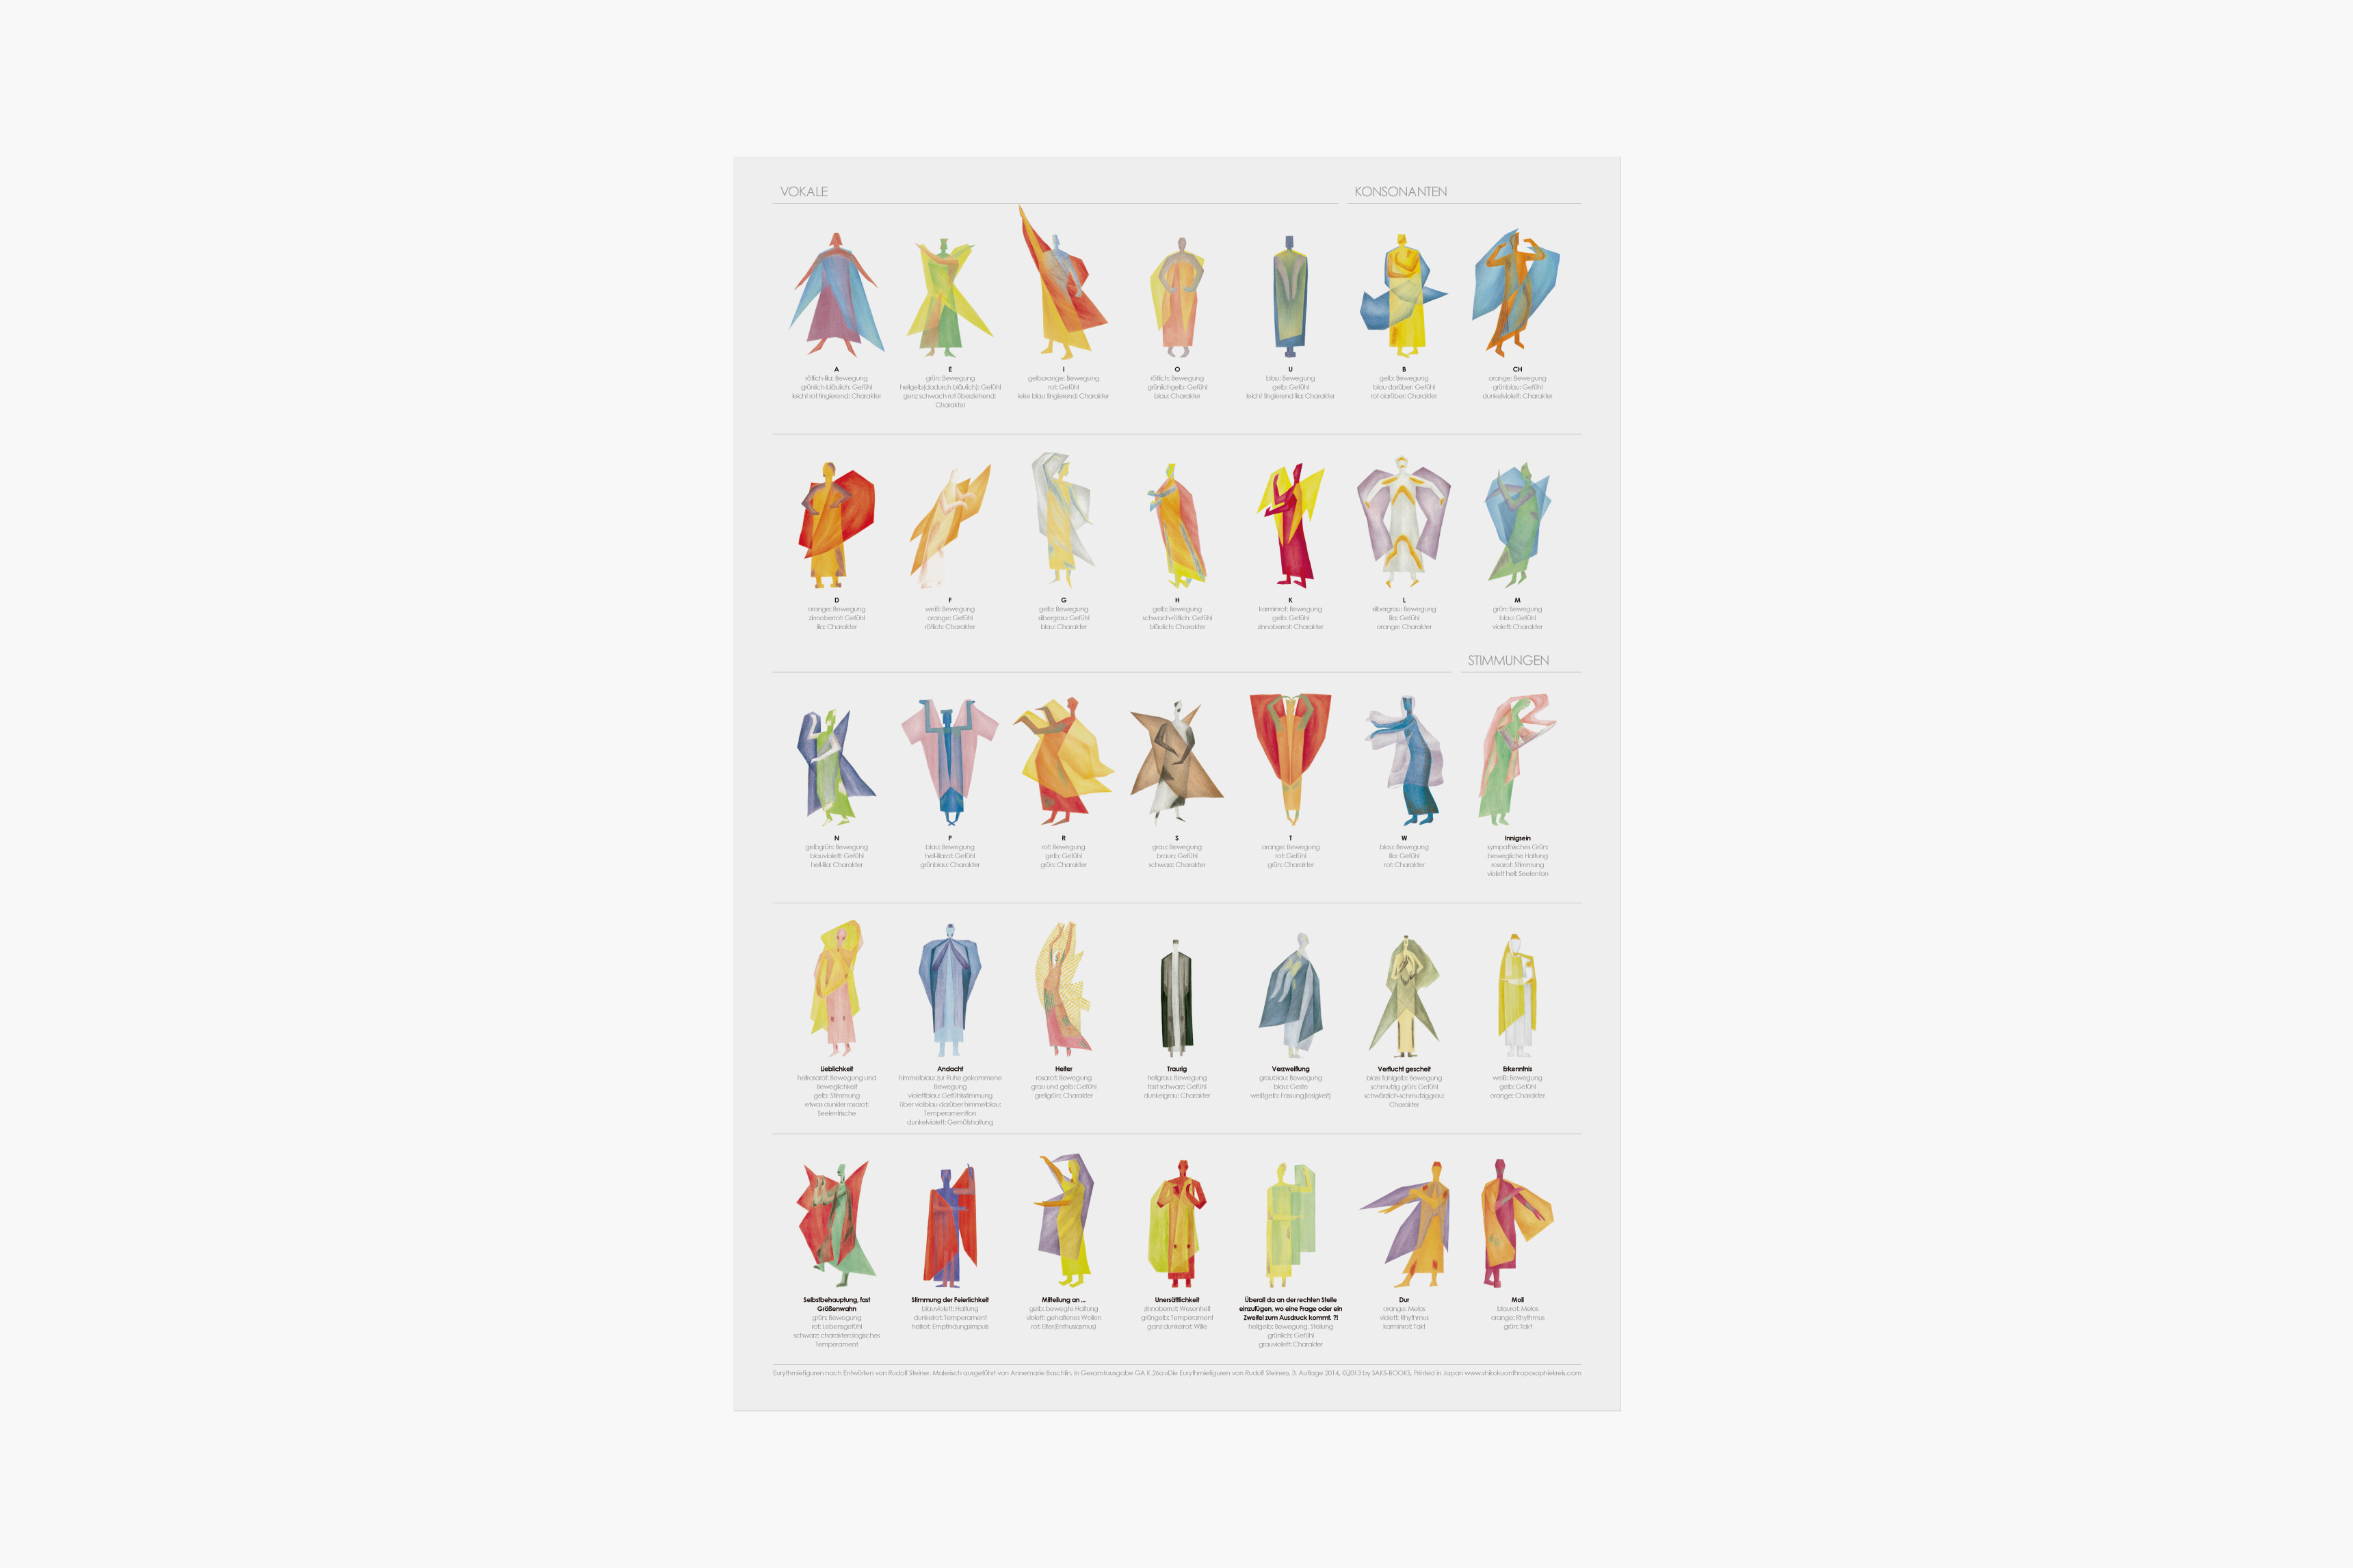 Eurythmiefigure Poster Redesign | Yuta Takahashi